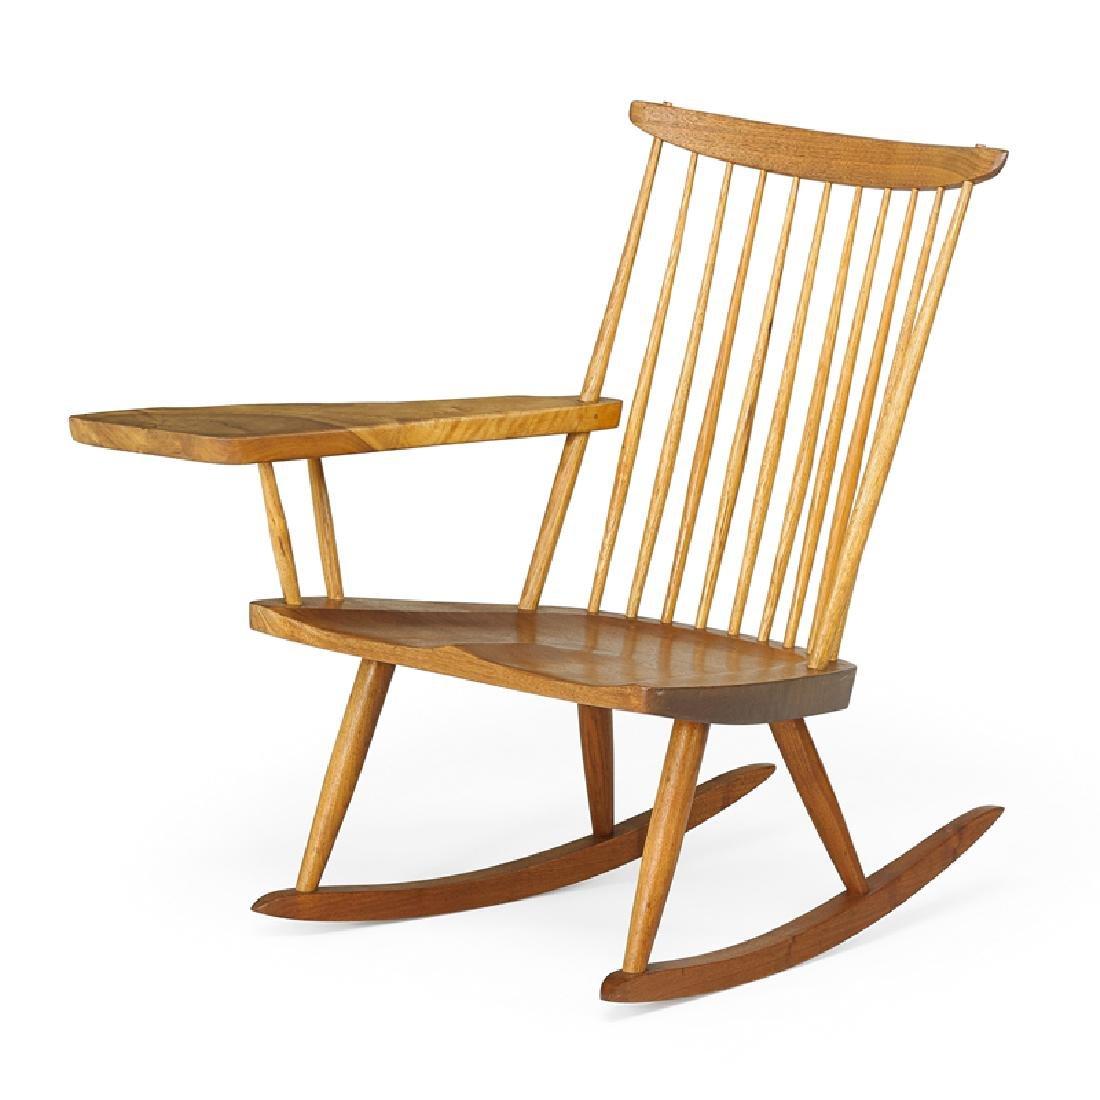 GEORGE NAKASHIMA Lounge Chair Rocker with Arm